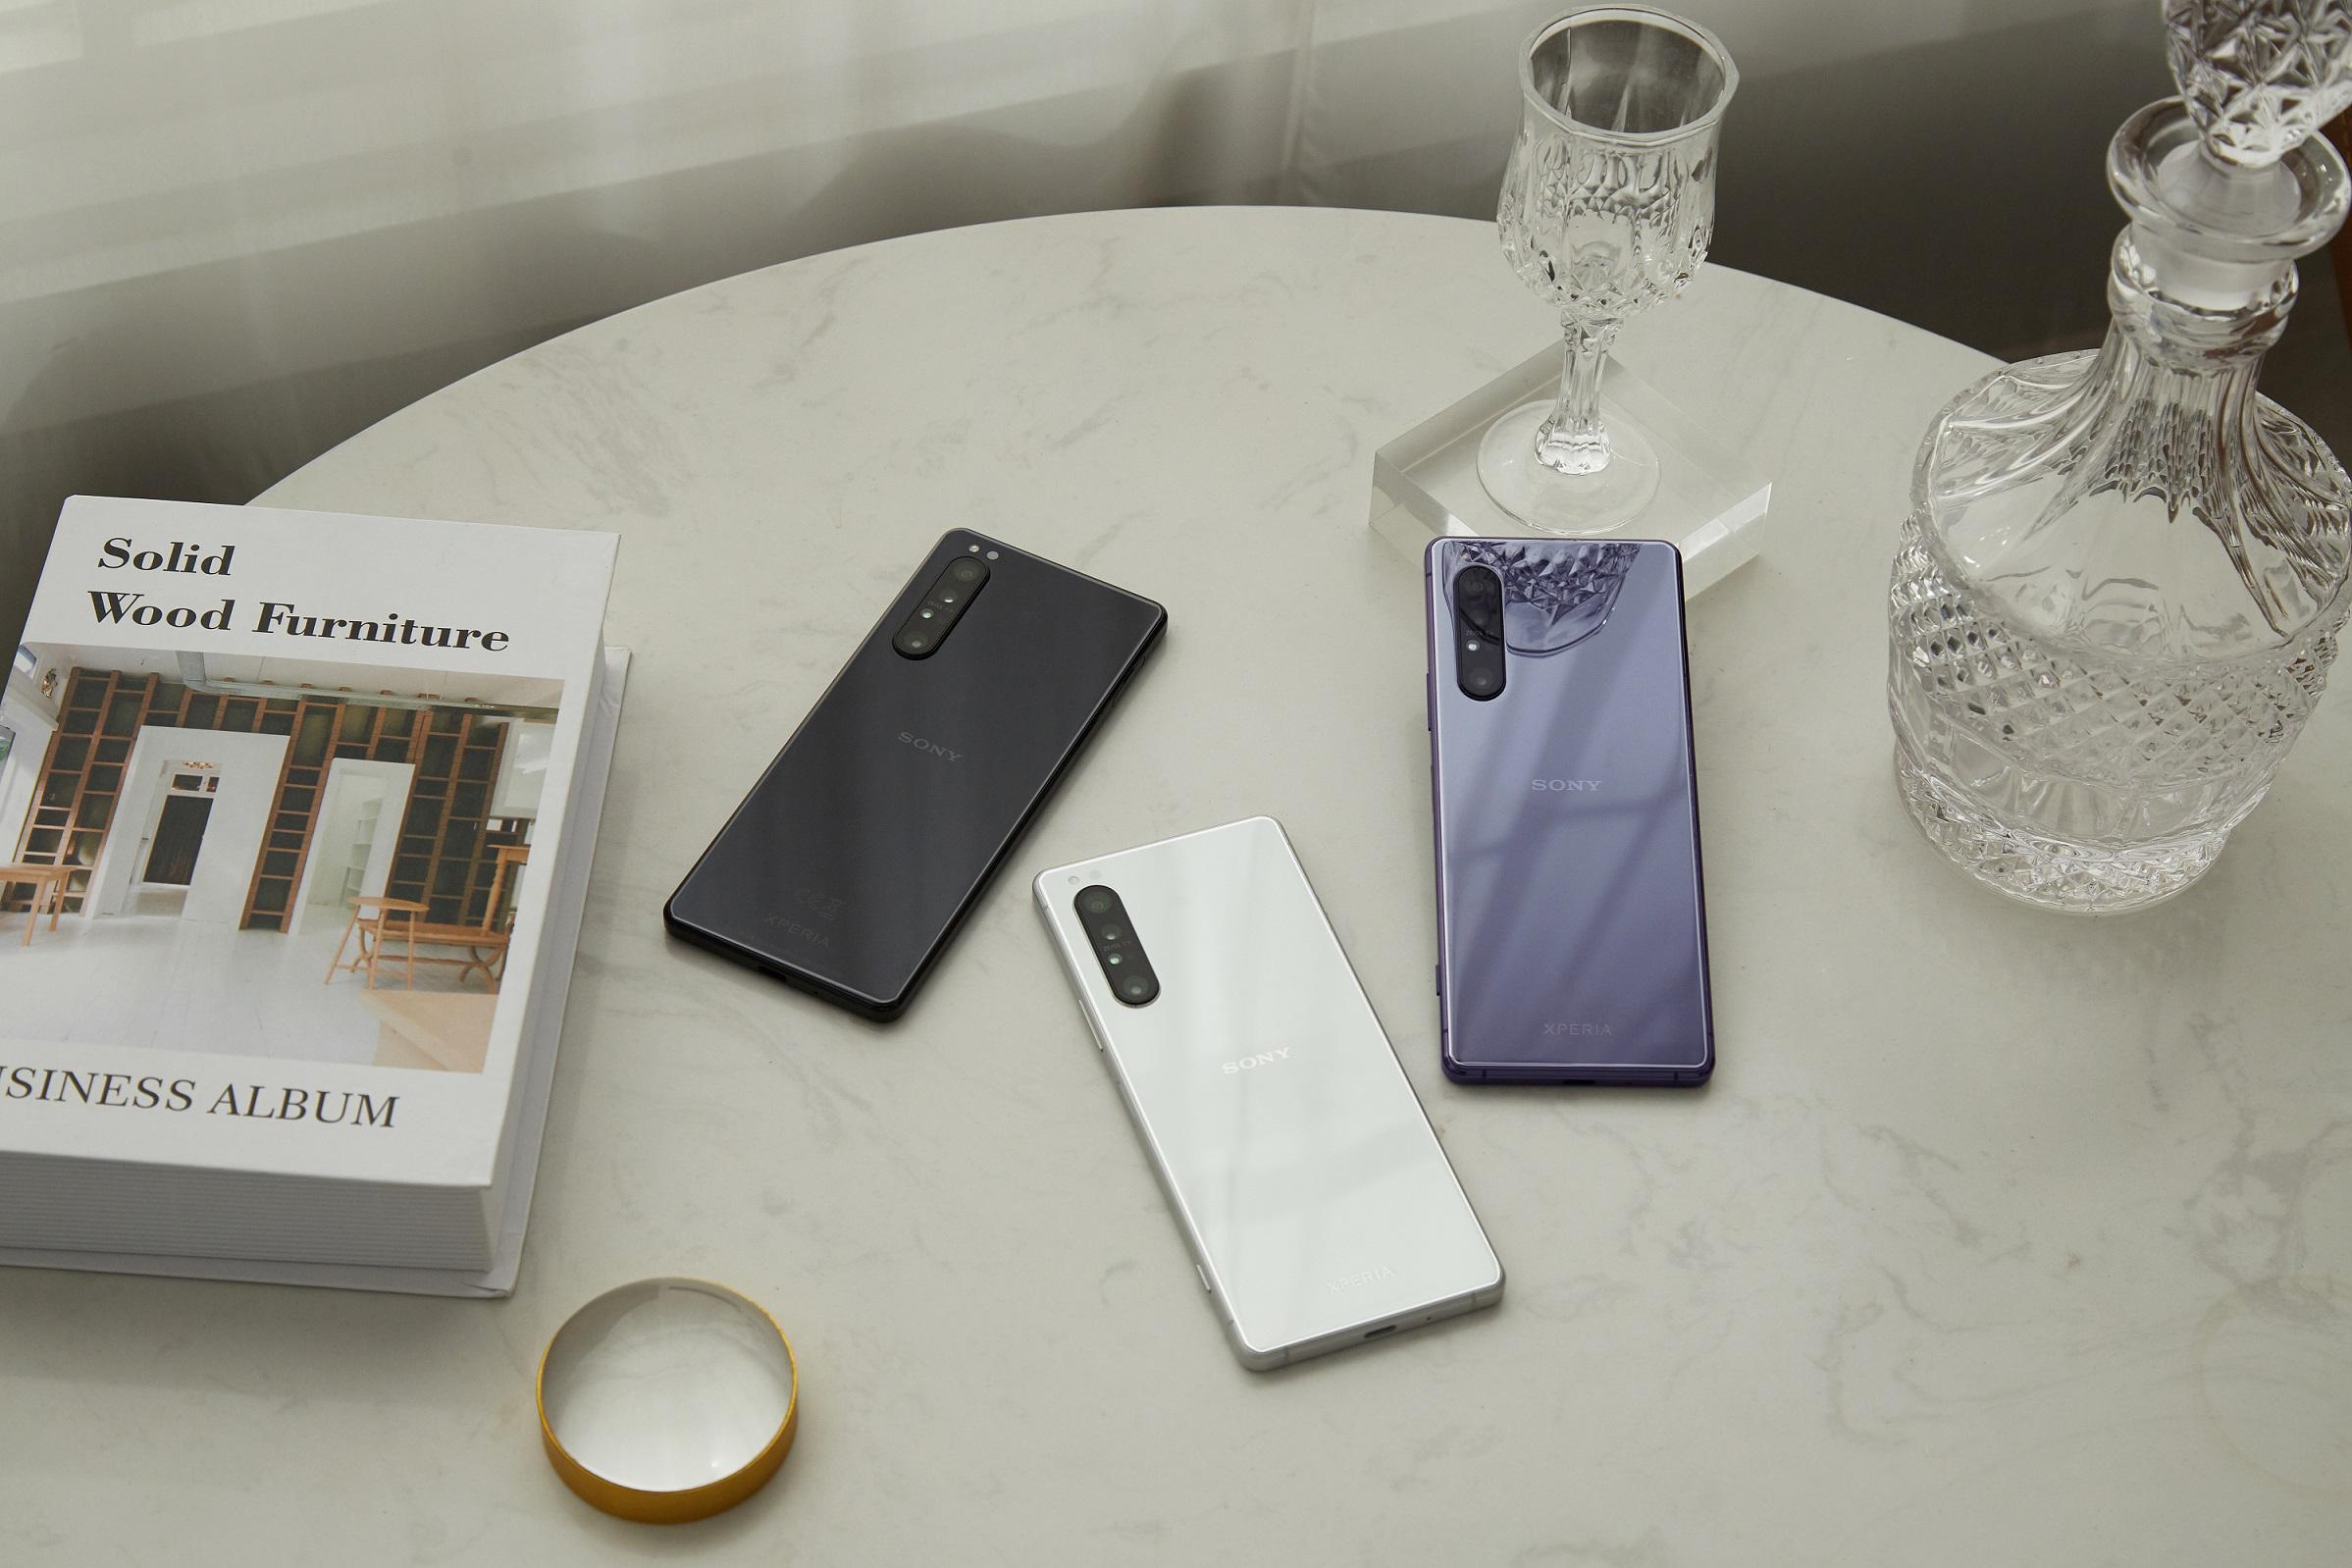 Sony Mobile向搶先預購Xperia 1 II成功的廣大索粉們釋出優先領機的好消息,將自0618起率先領機!(2)